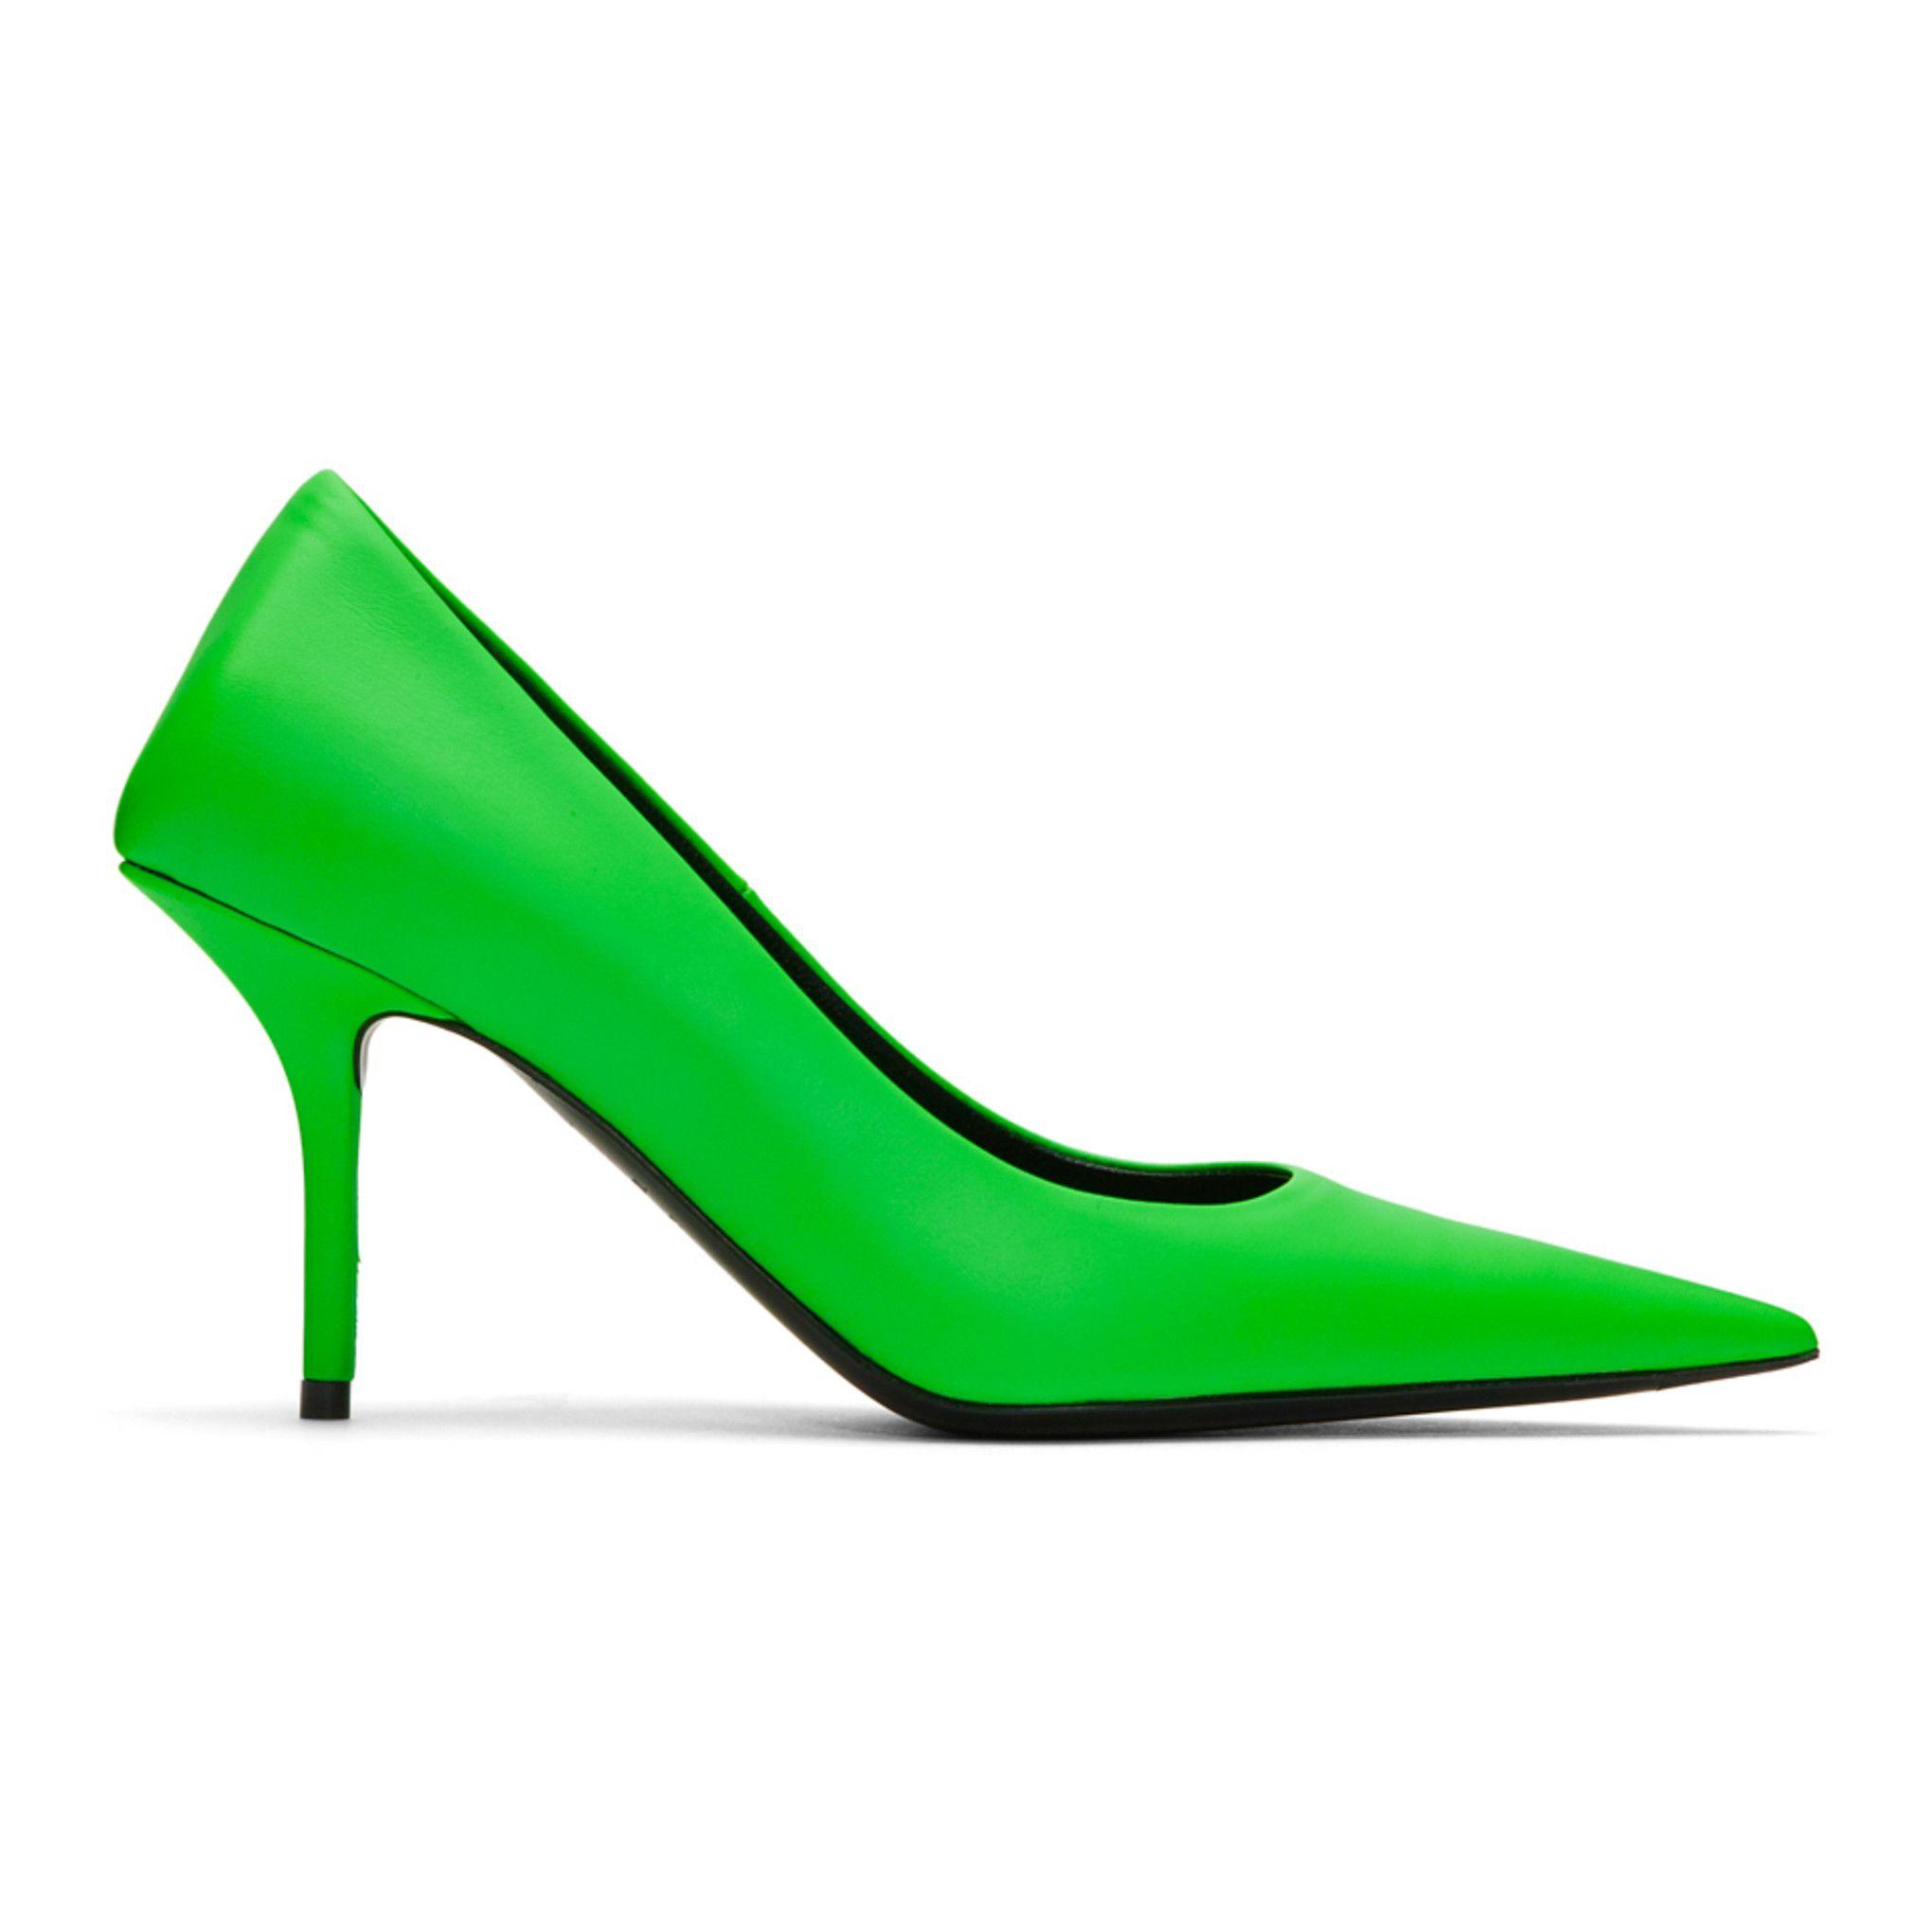 Balenciaga - Green Square Knife Heels